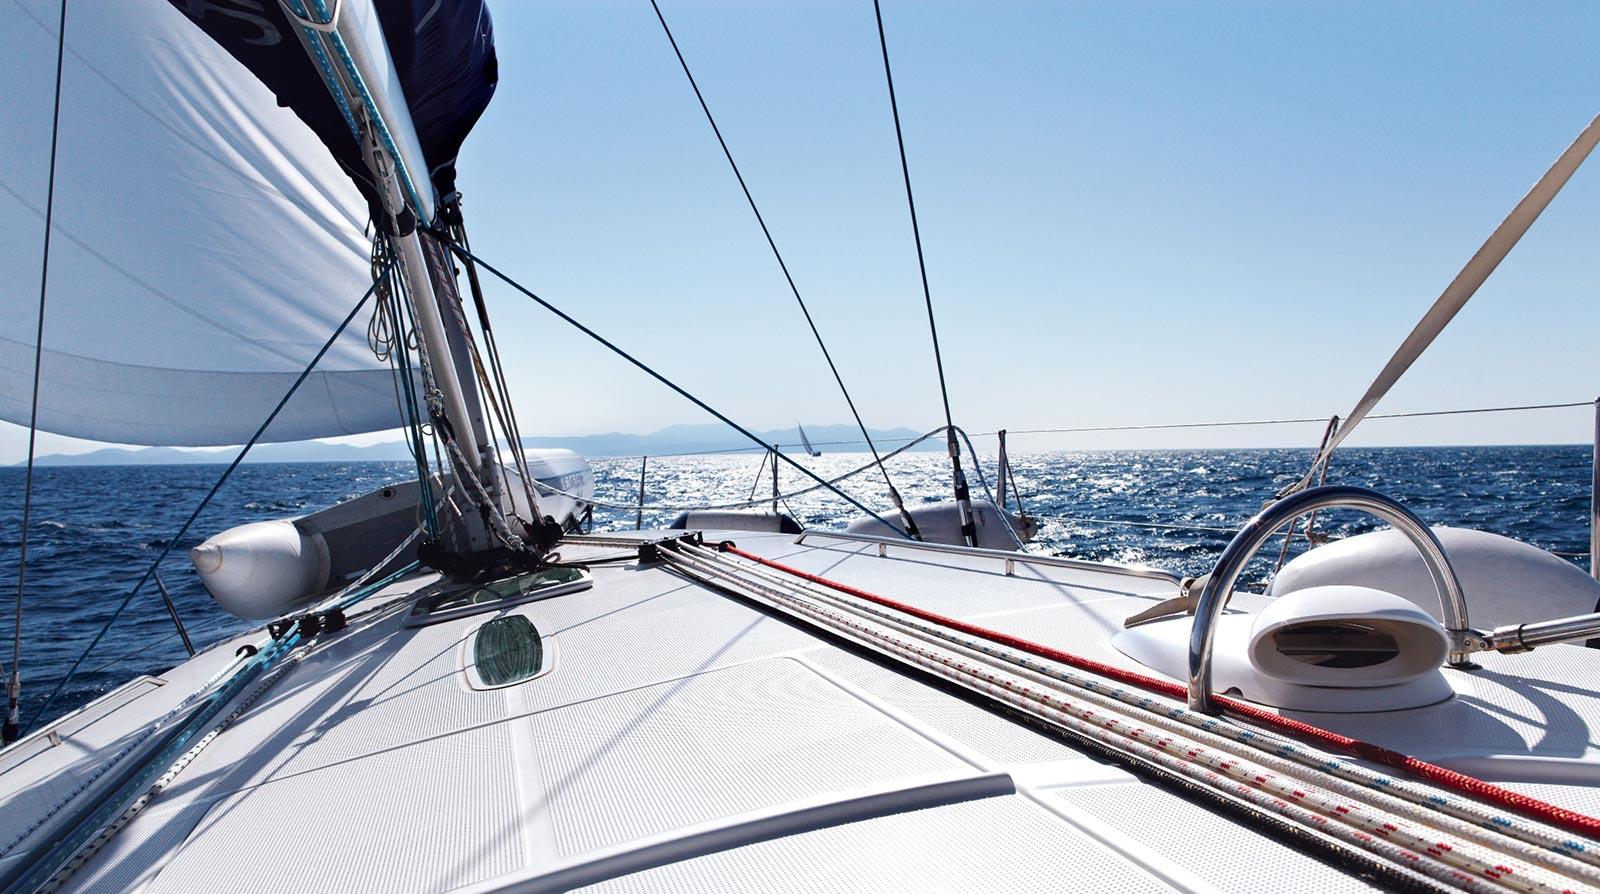 club-yacht-bg-1